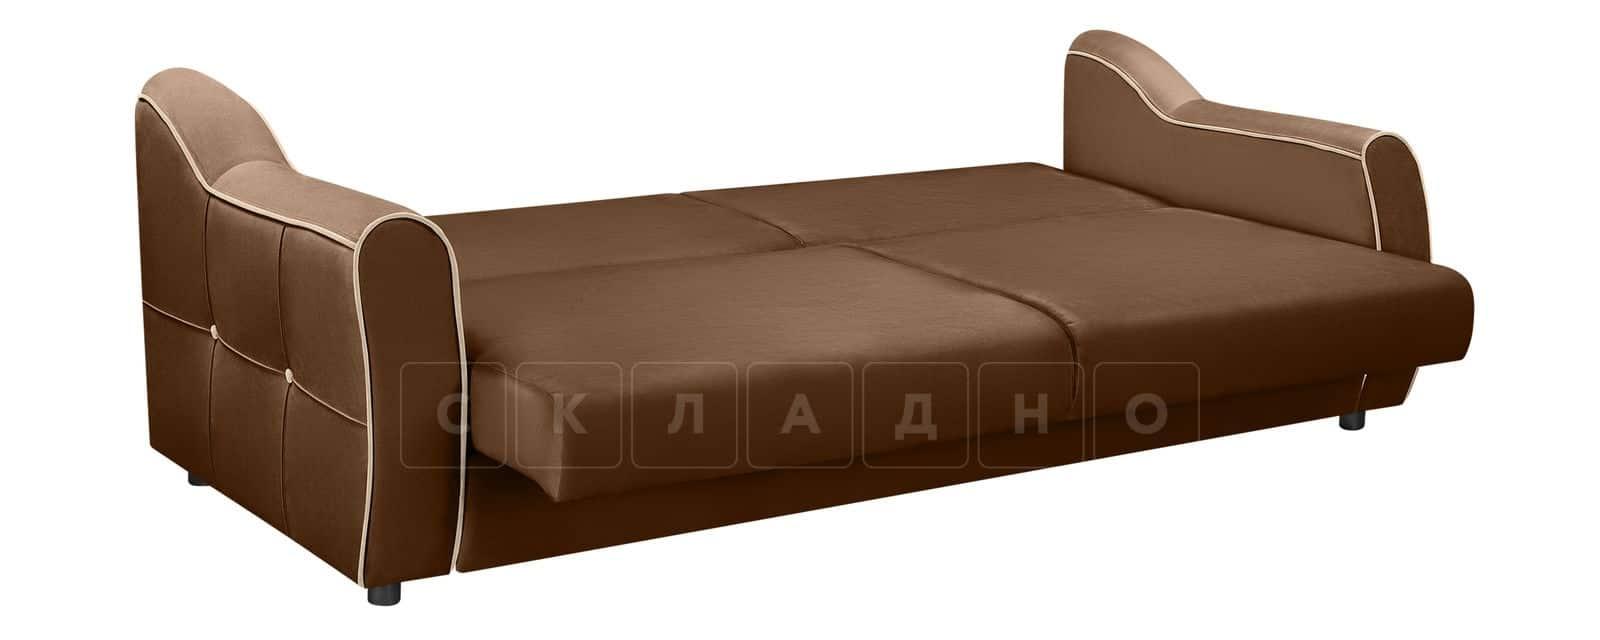 Диван Флэтфорд велюр коричневый фото 4 | интернет-магазин Складно